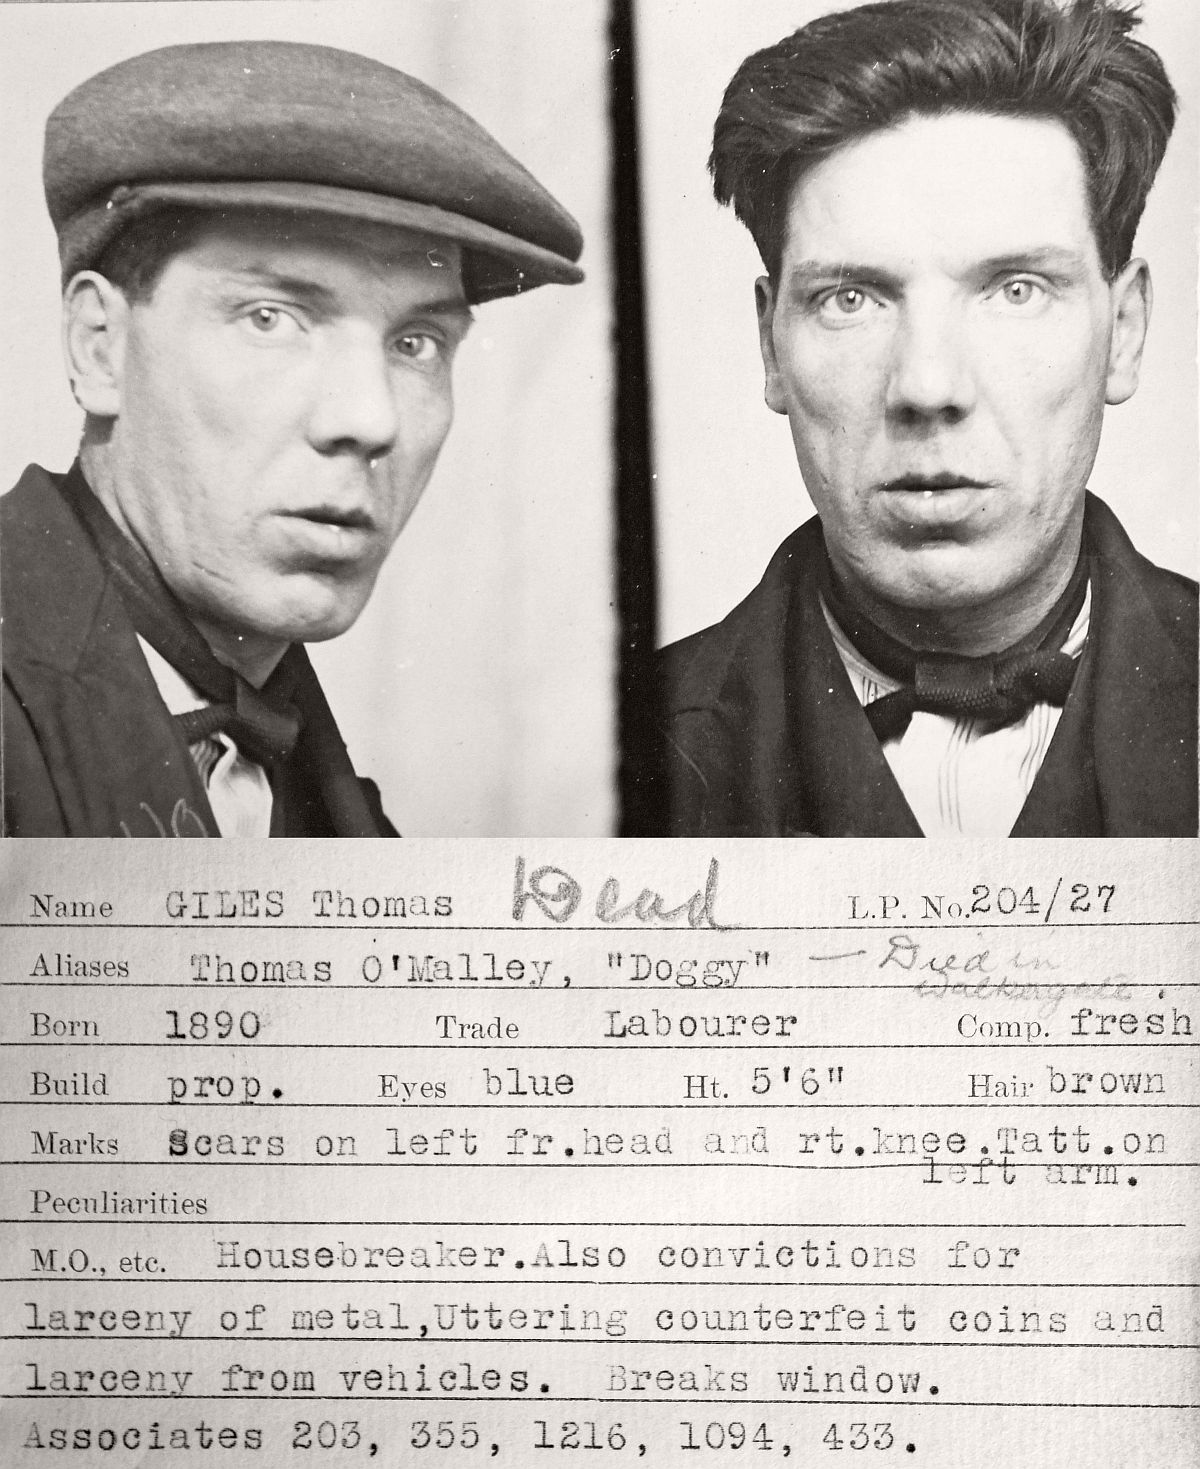 vintage-mug-shot-of-criminals-from-newcastle-upon-tyne-1930s-17